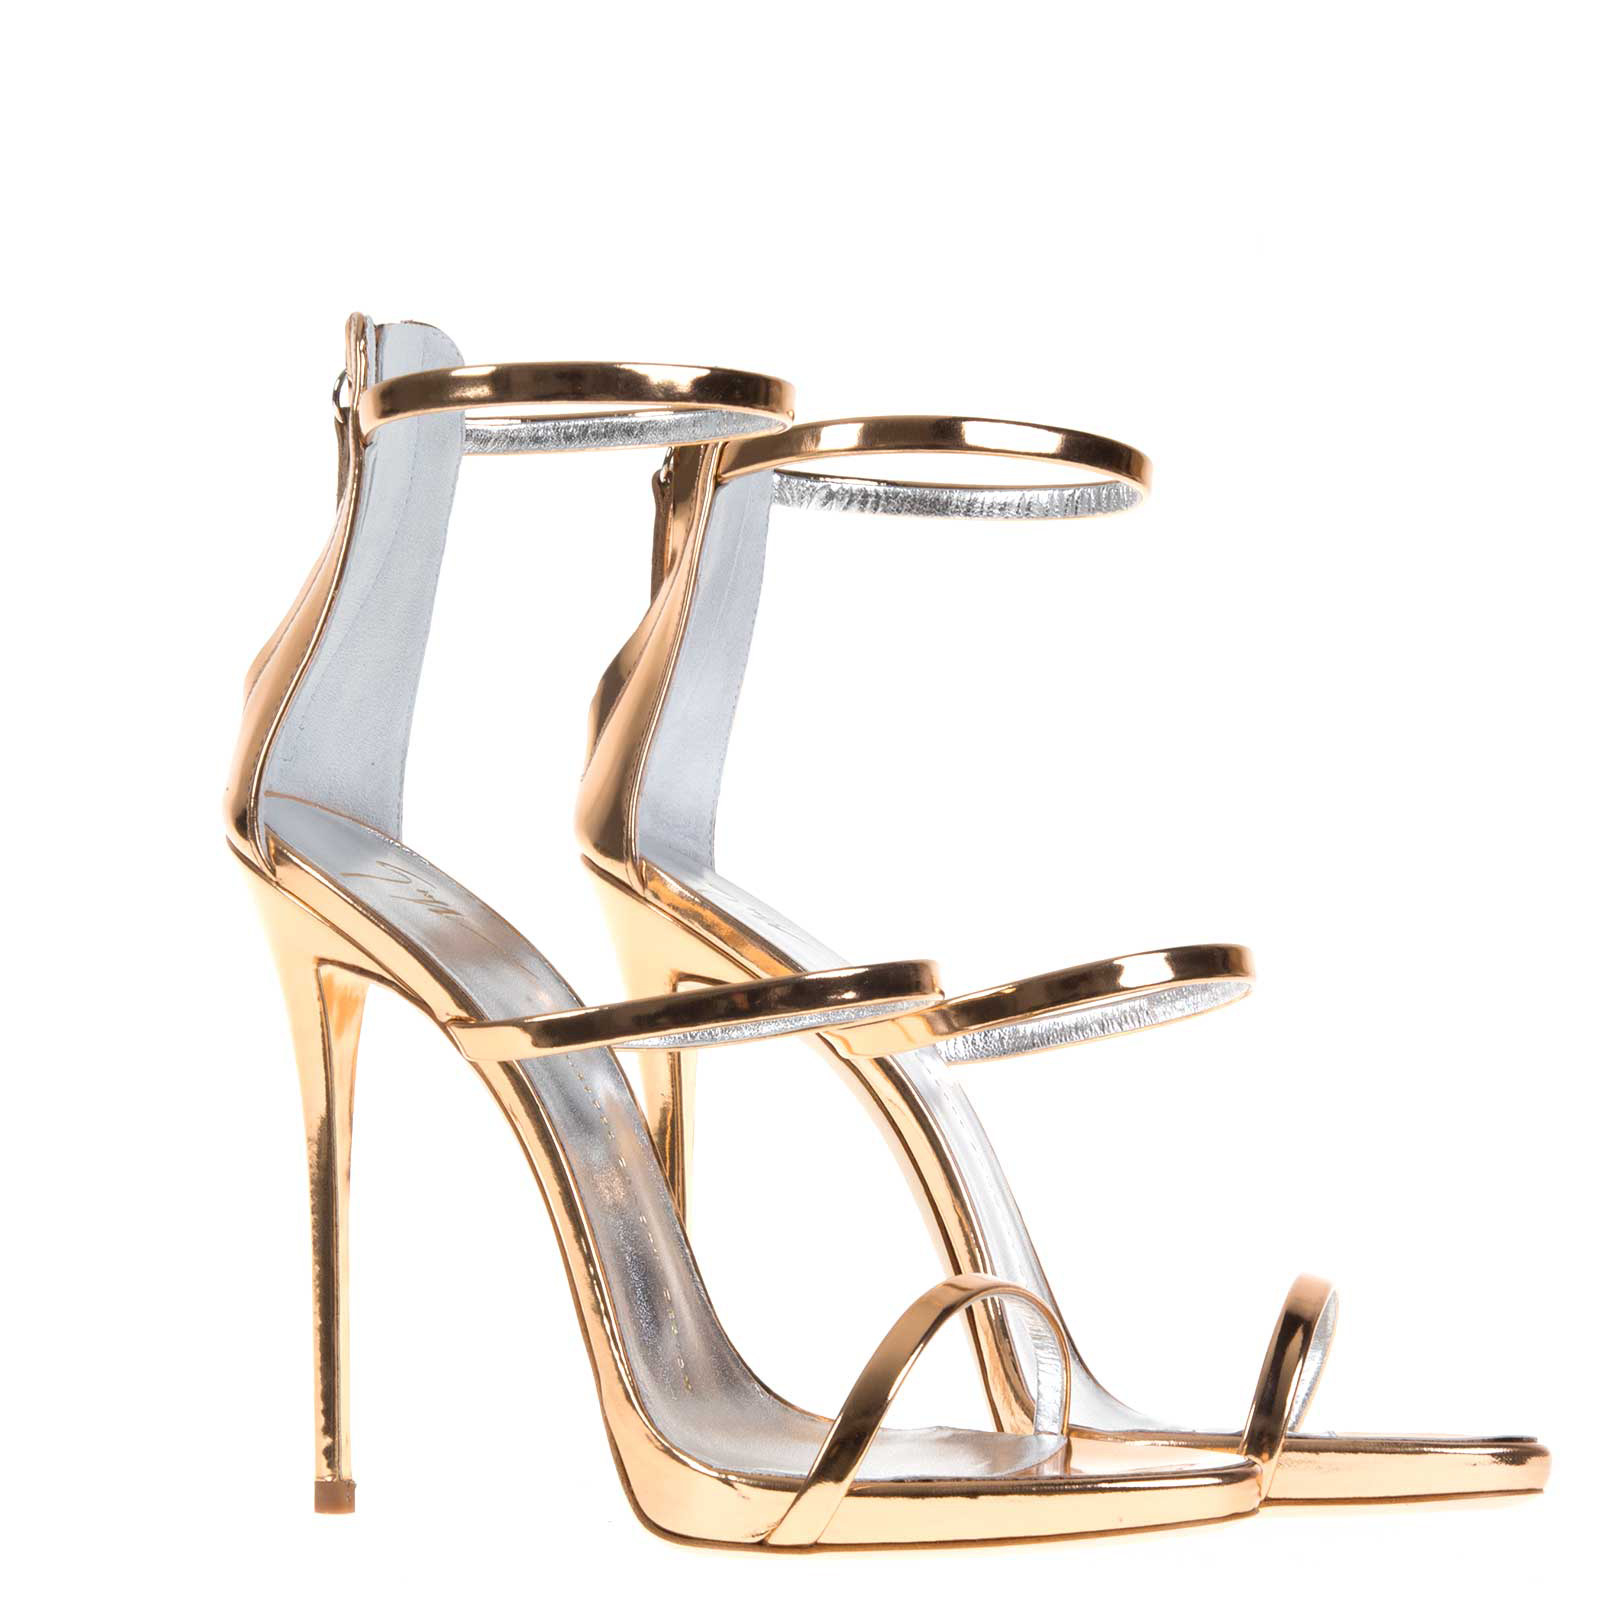 Harmony Metallic Leather Sandals - Gold Giuseppe Zanotti Uu3JjIjQ0j